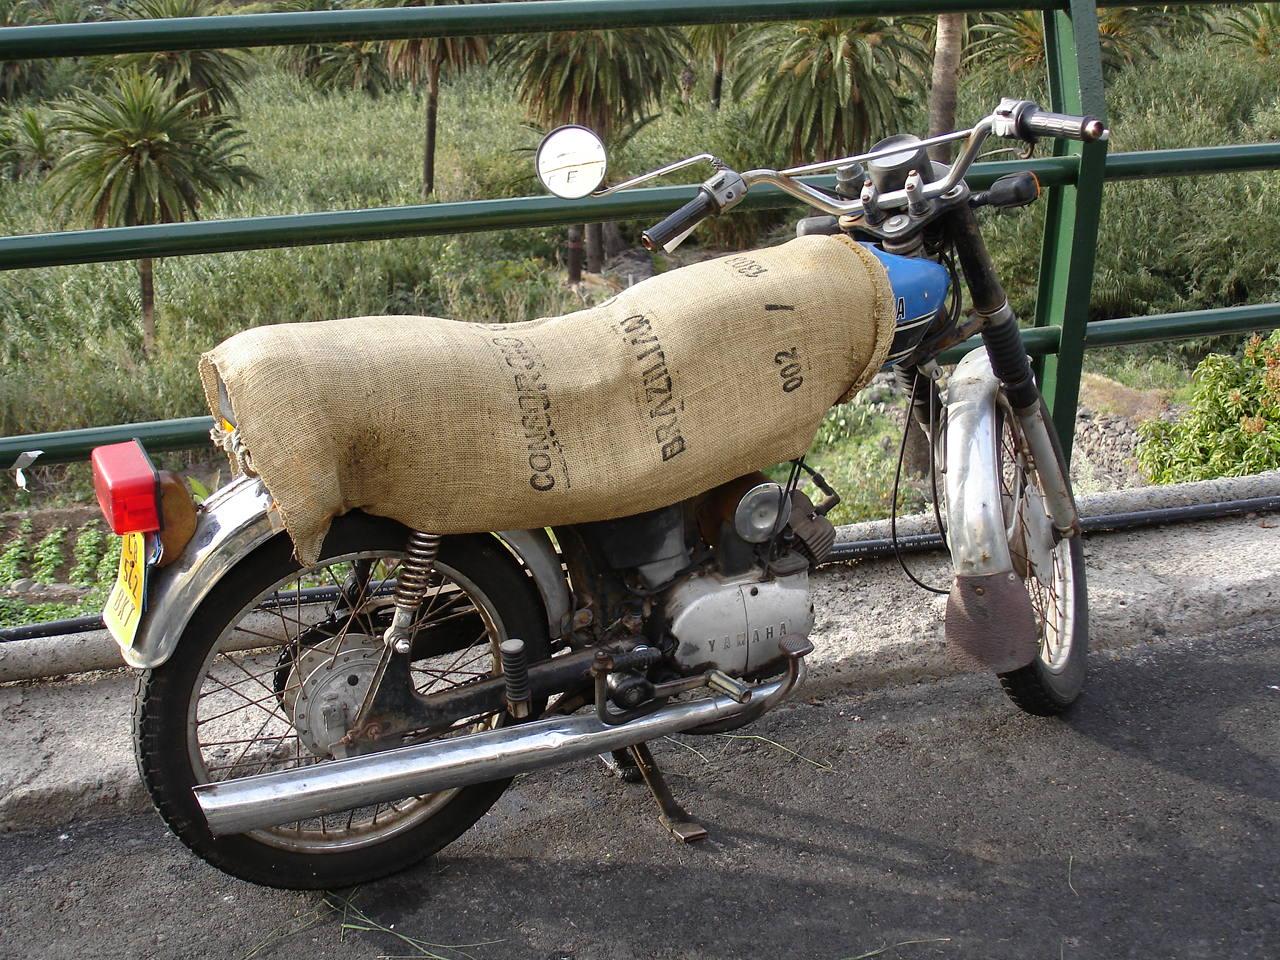 ...ride on...